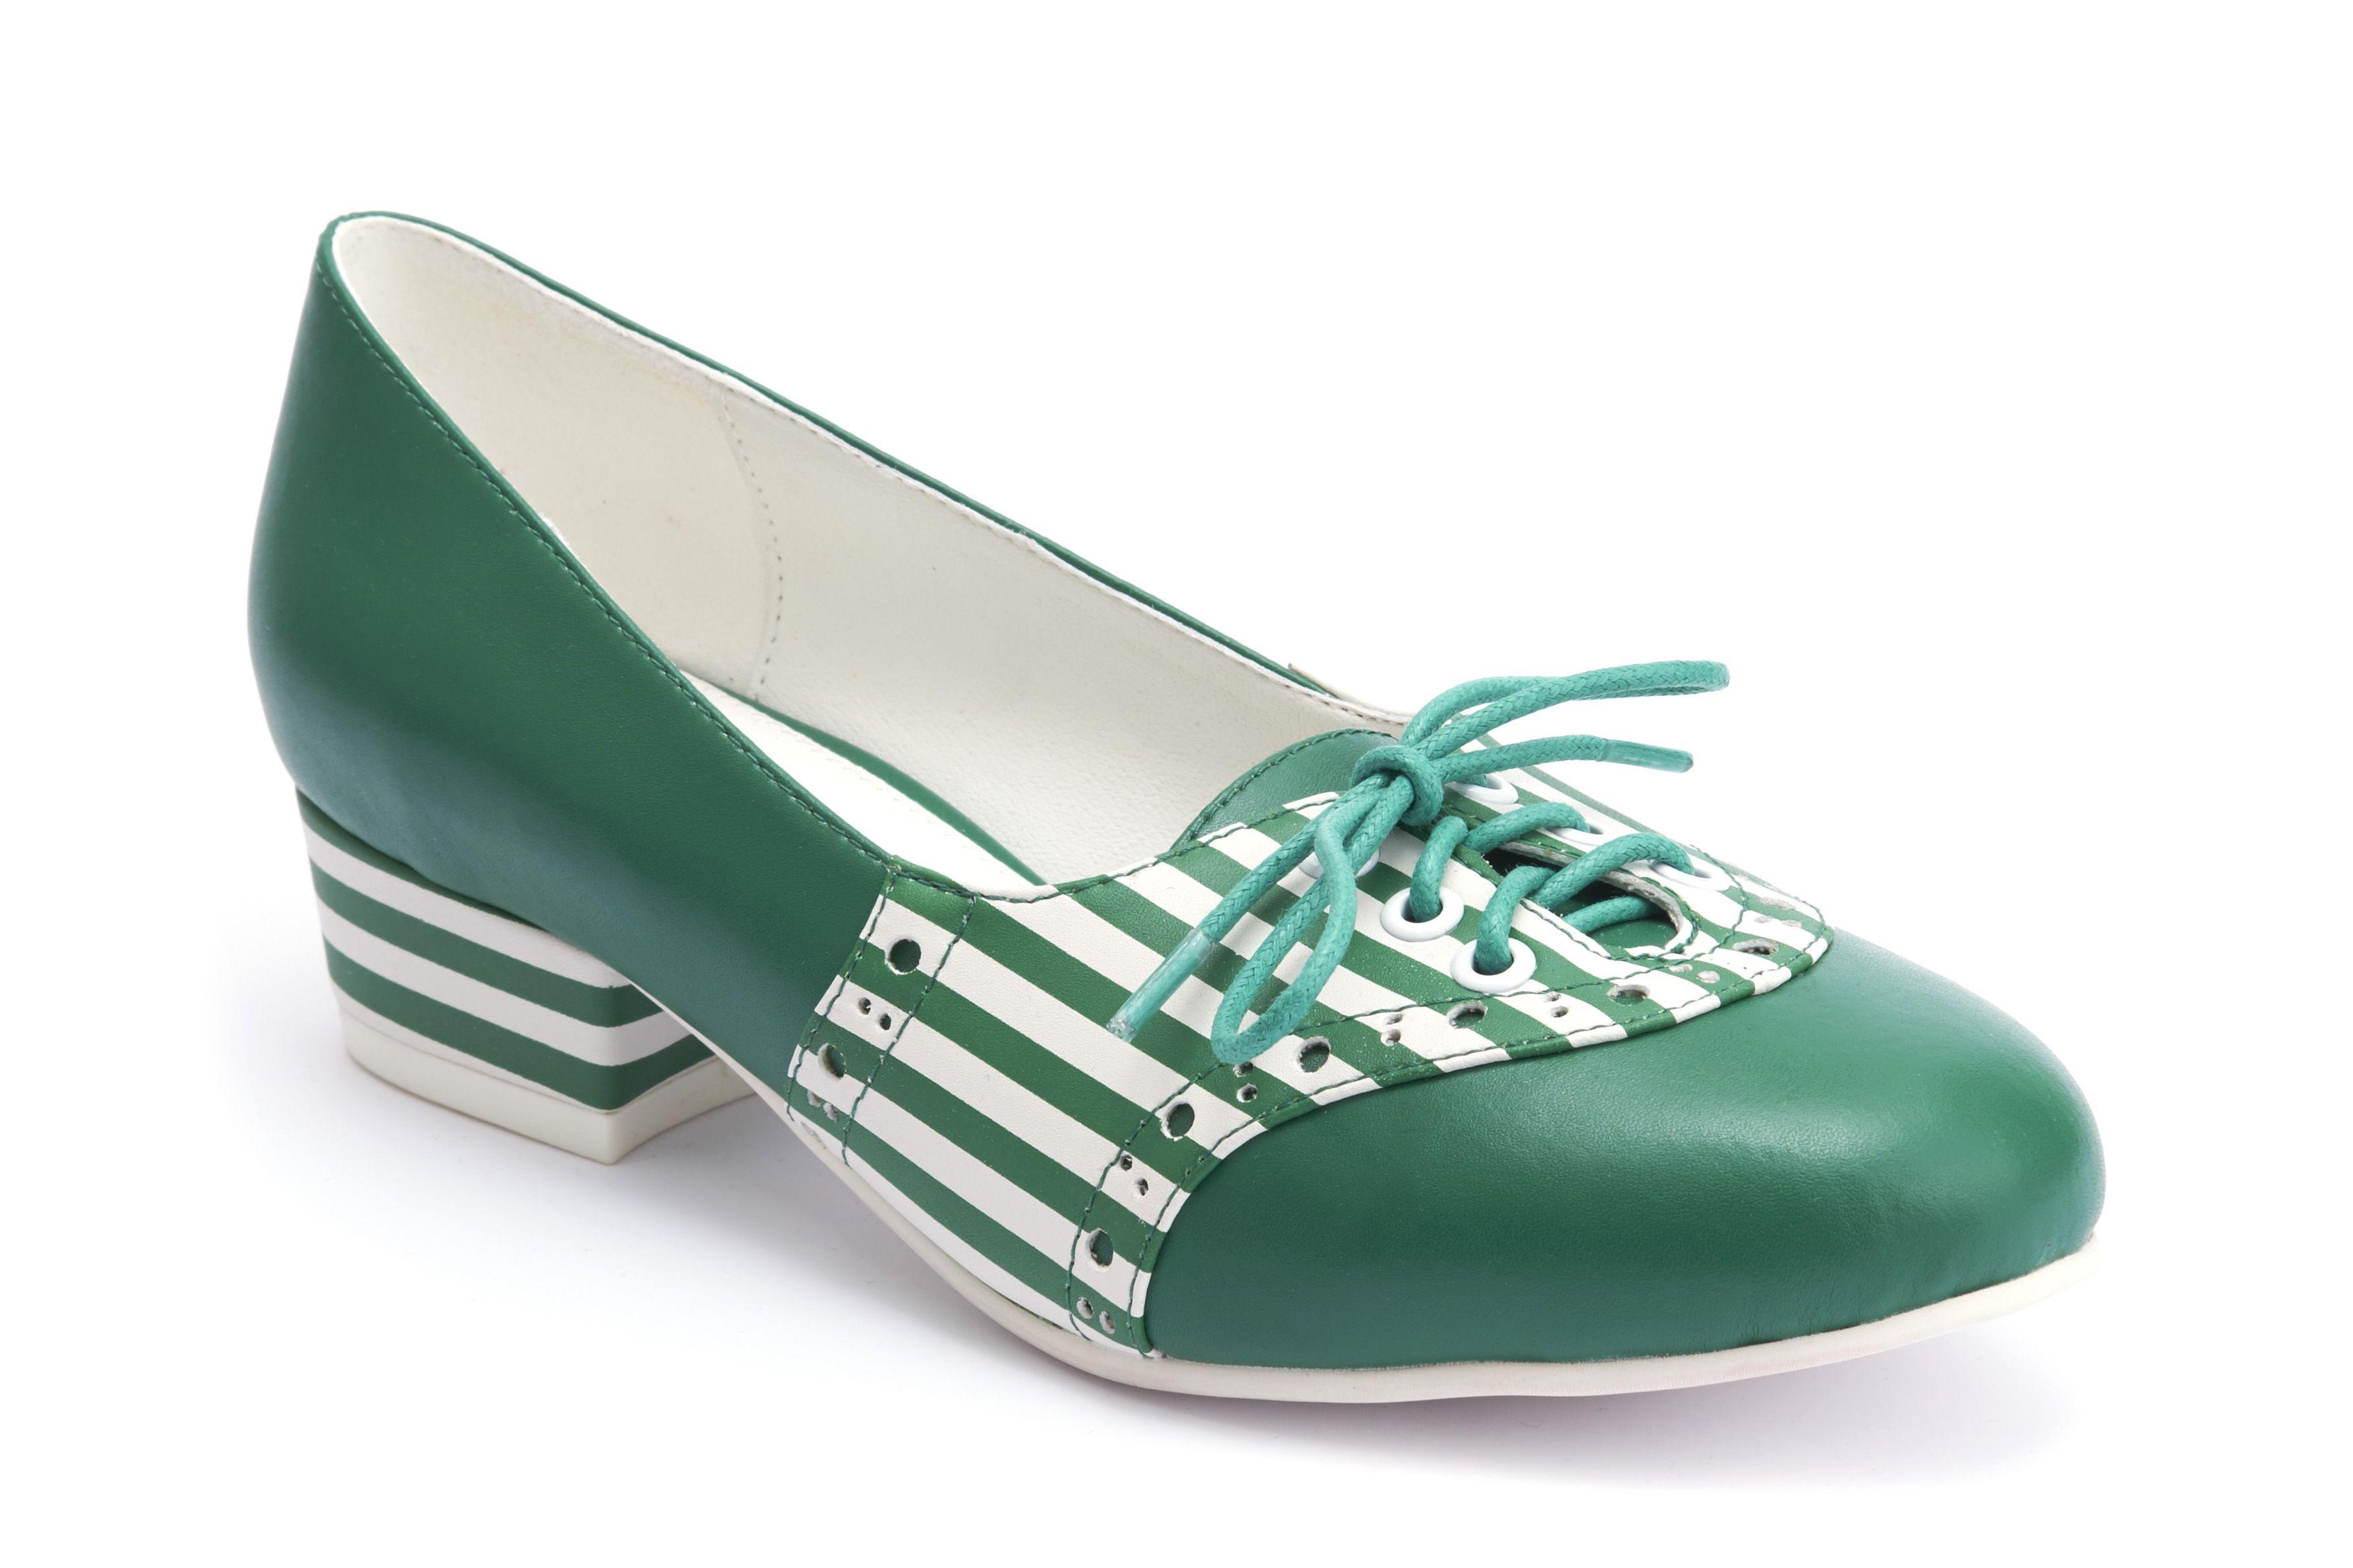 Alice Green Stripes Vegan Shoes Green Stripes Shoes Stripes